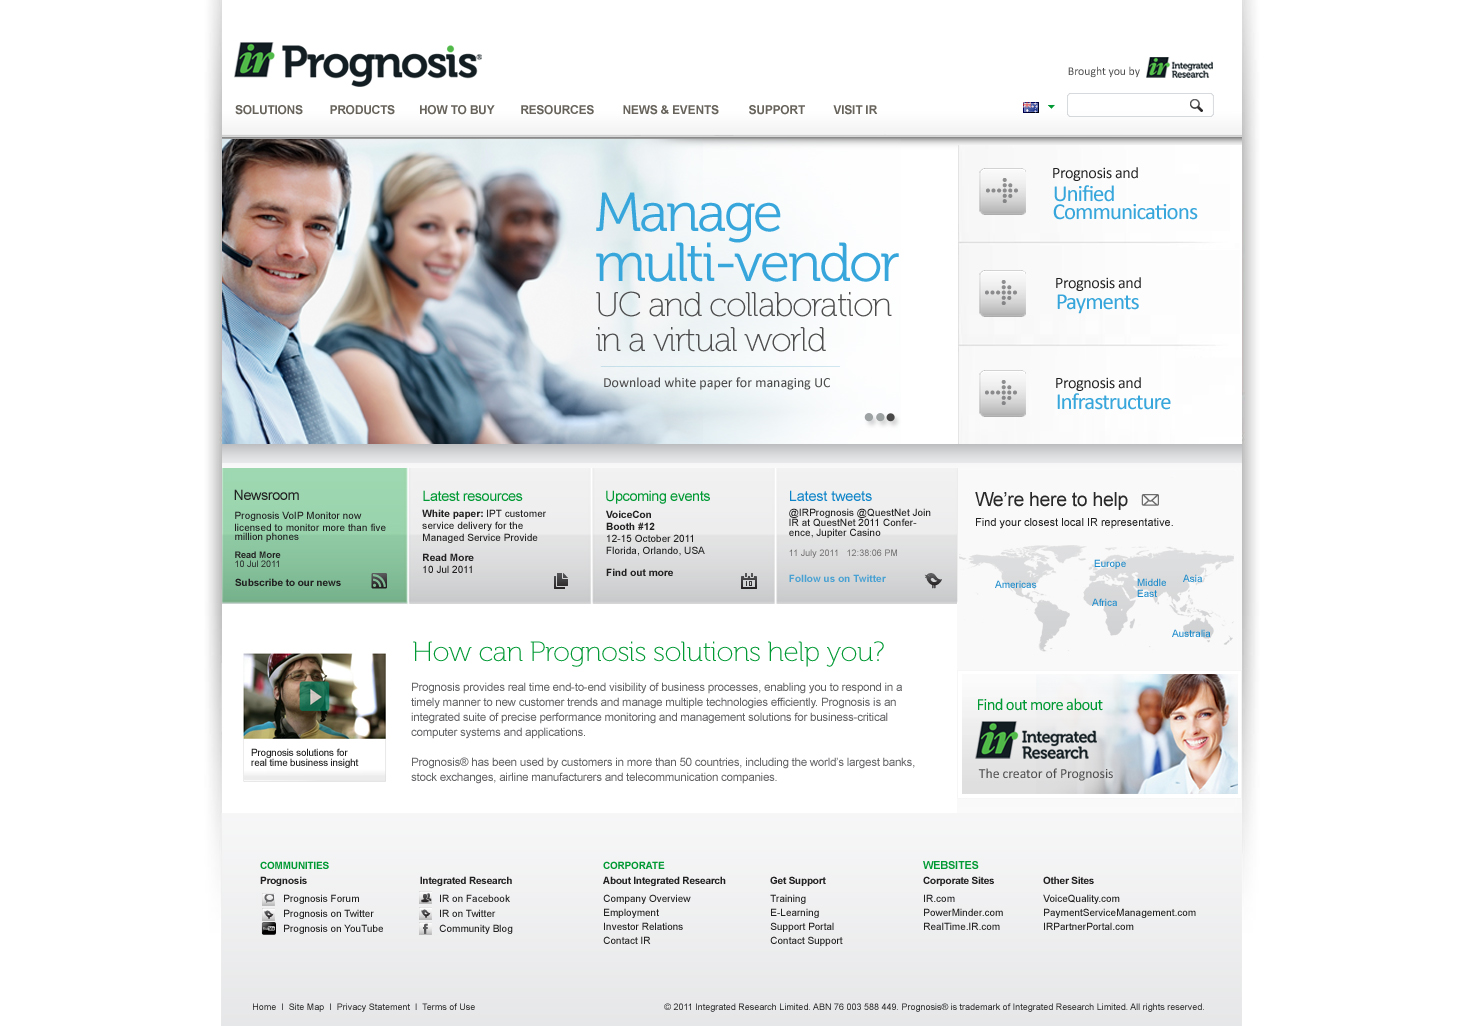 PrognosisWebsite-Homepage